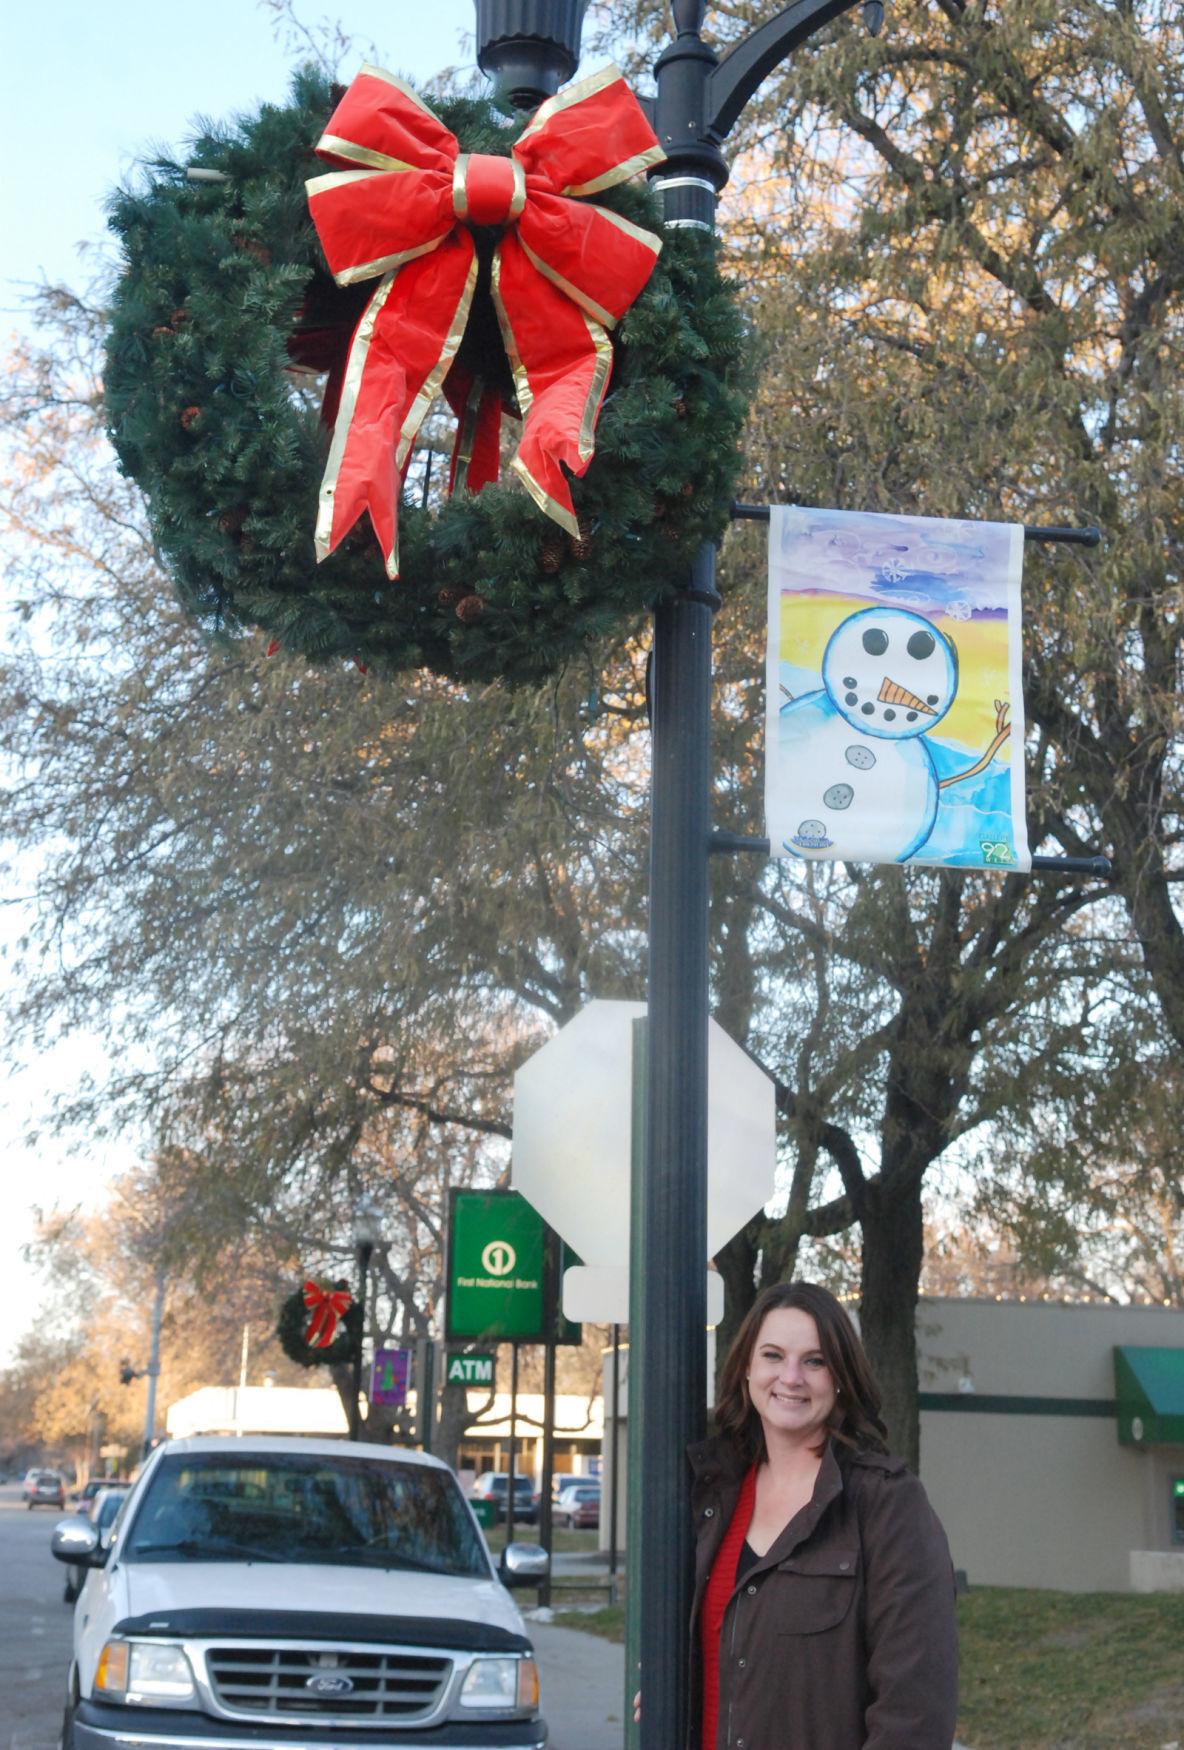 Woman by wreath on pole